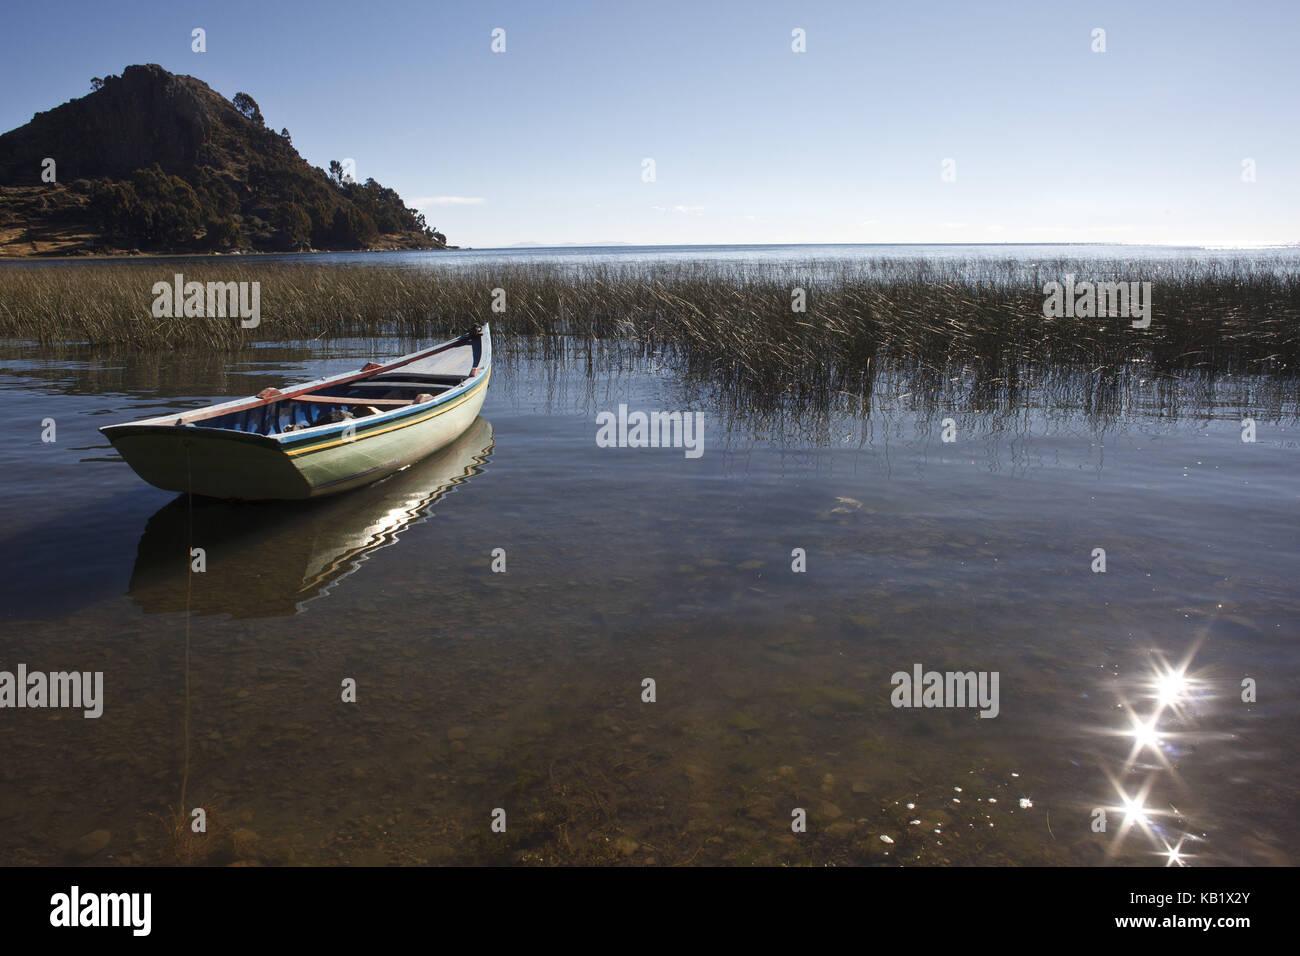 Bolivia, Titicacasee, Copacabana, Boat, - Stock Image